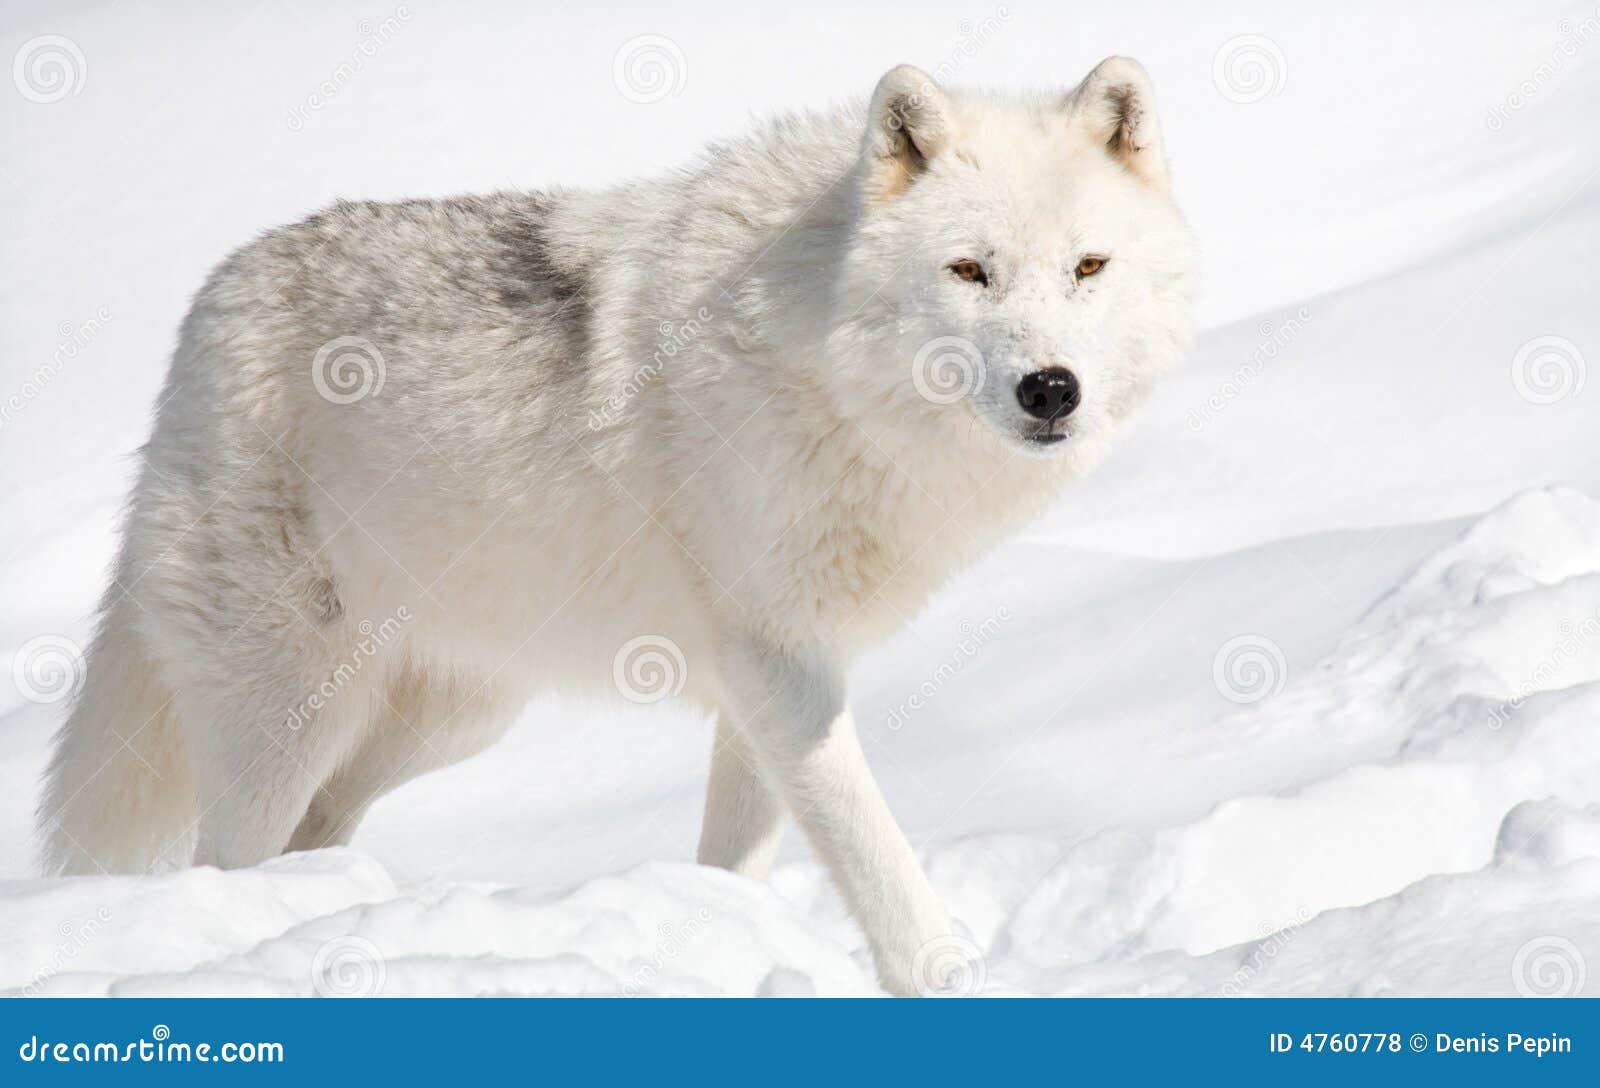 Arctic wolf in snow - photo#18